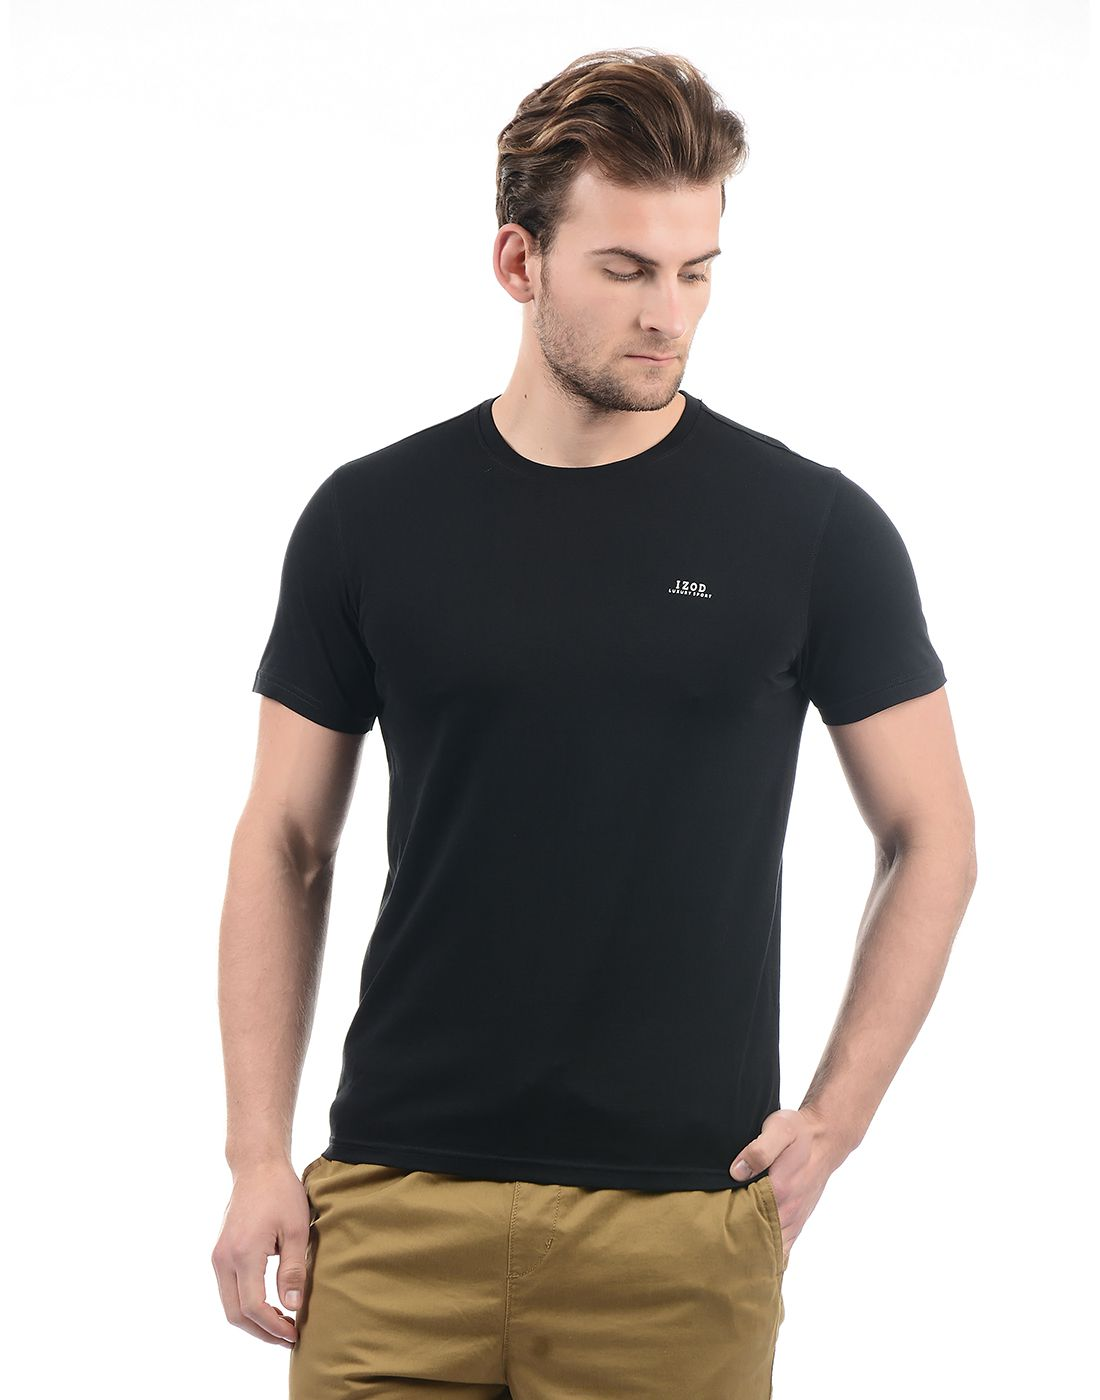 IZOD Black Round T-Shirt